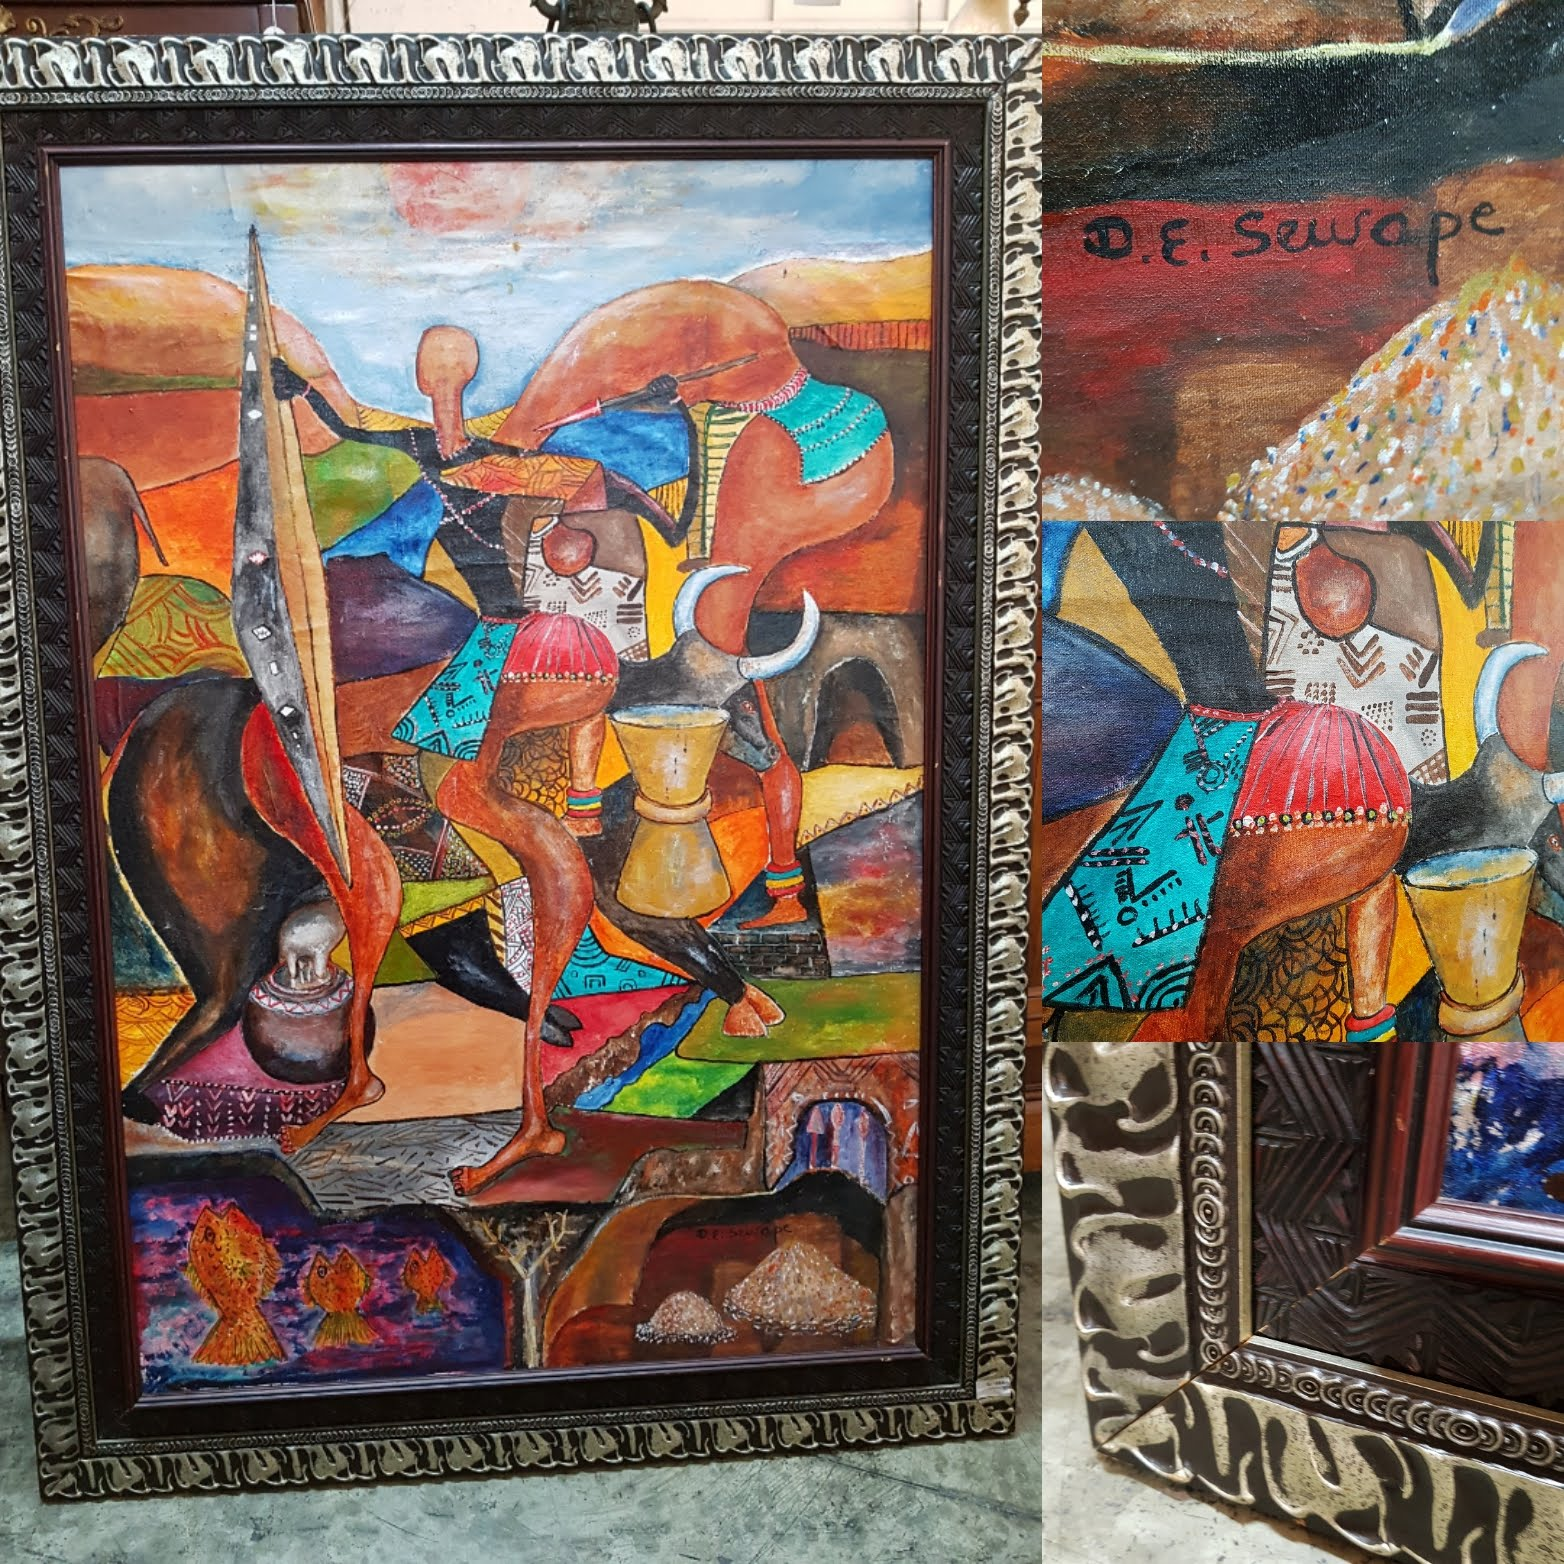 South African Original Artwork